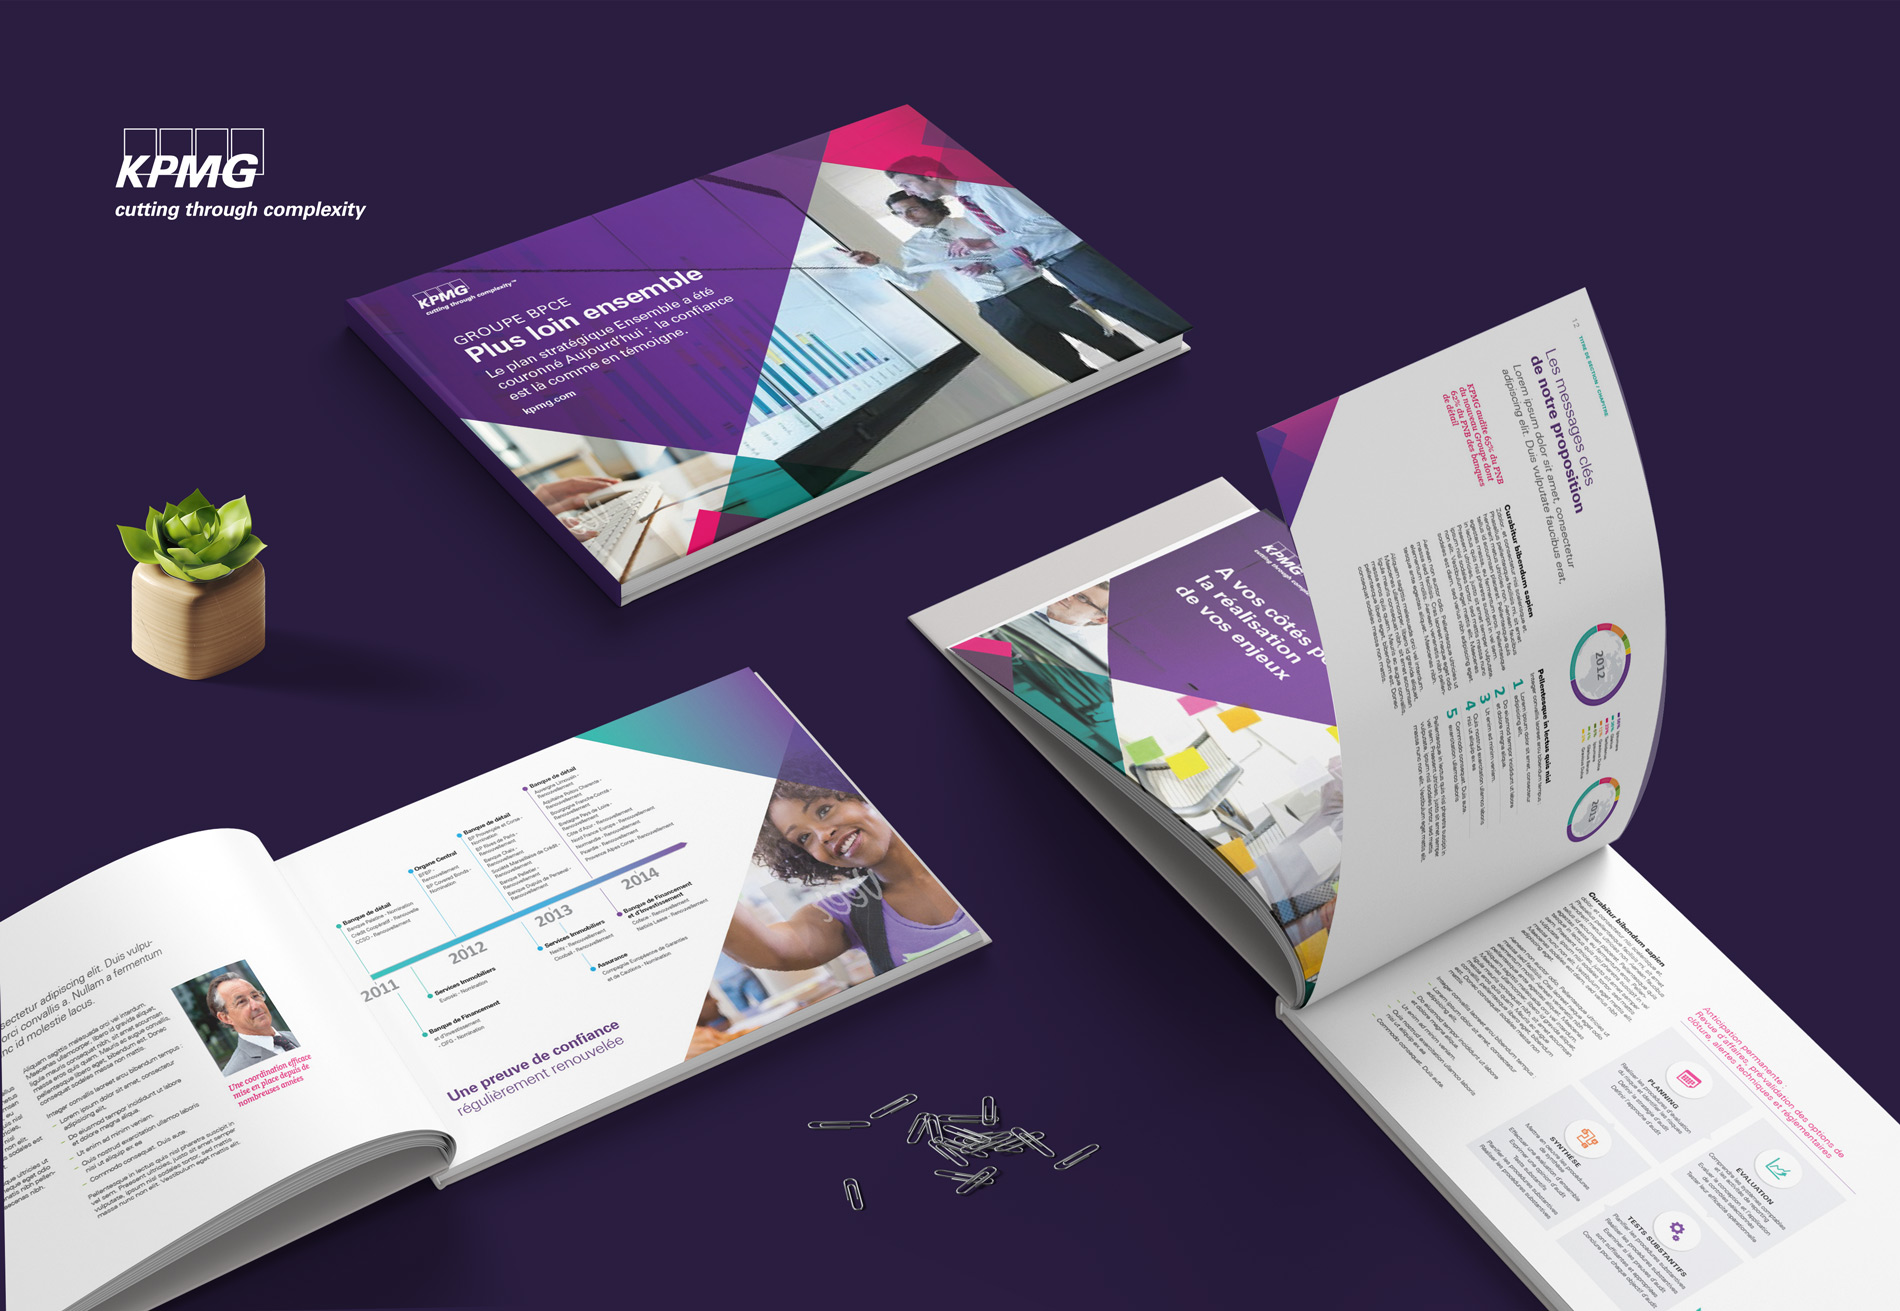 KPMG business proposal brochure design